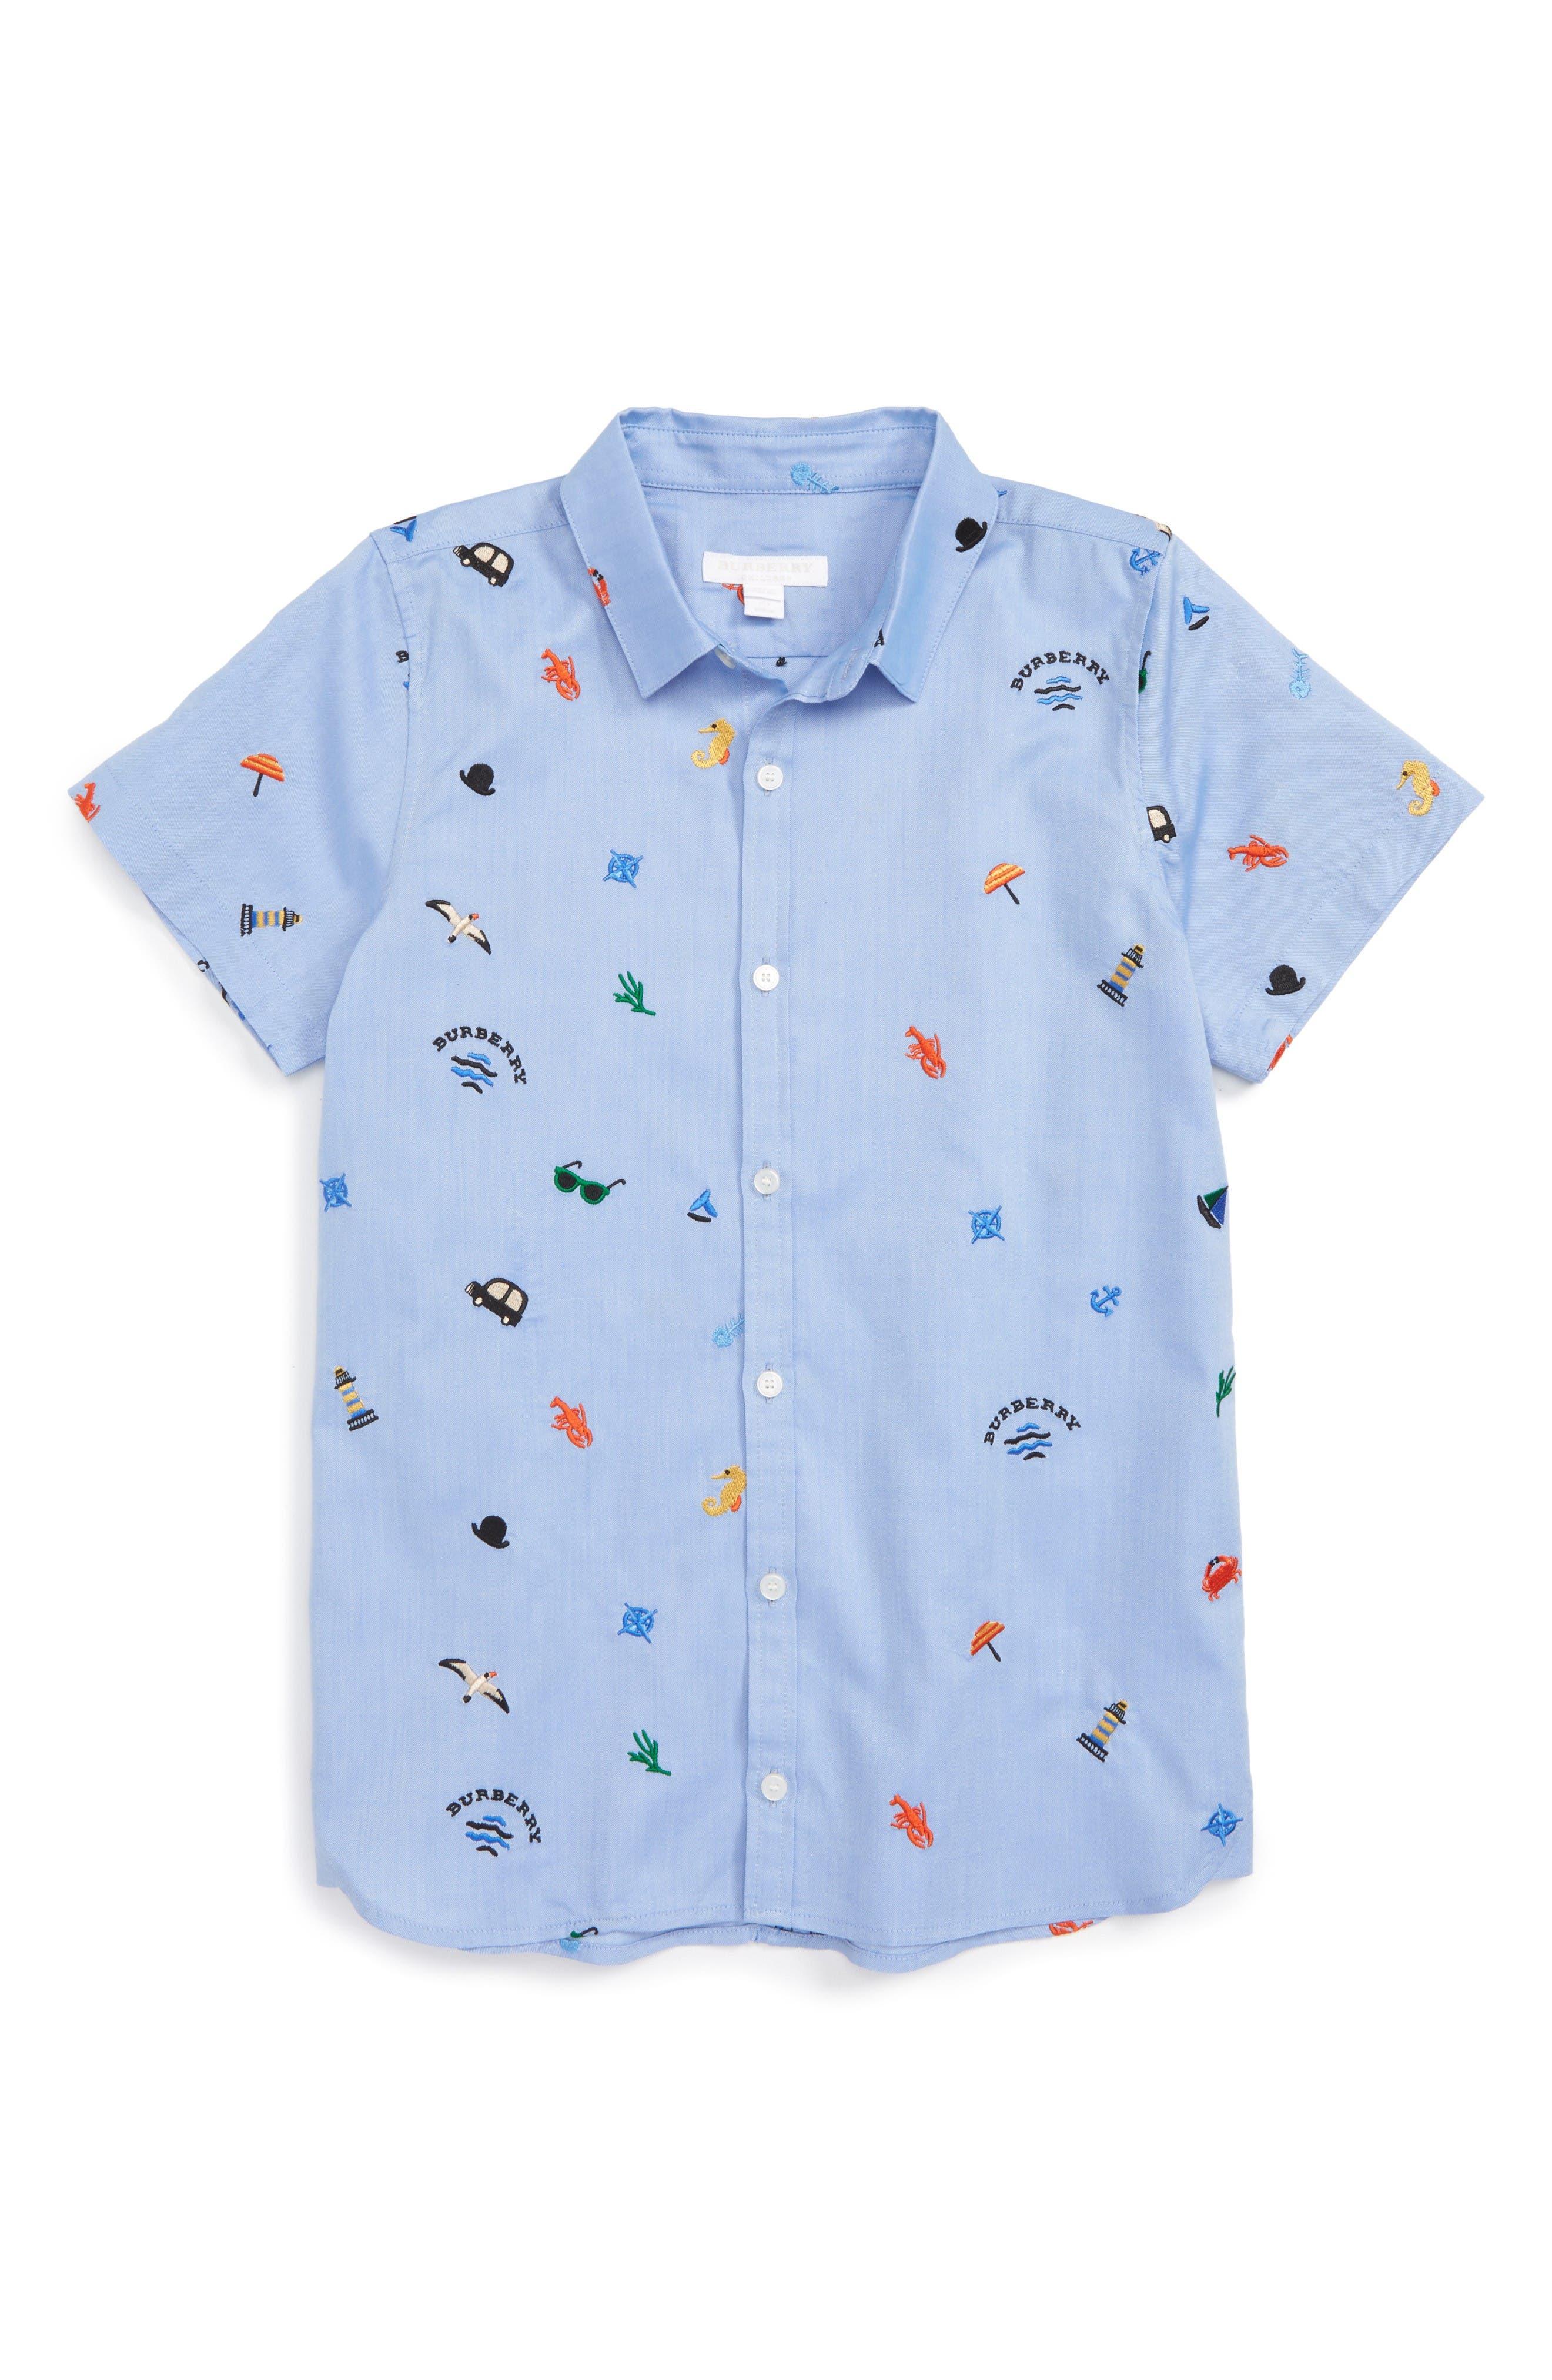 Burberry Clarkey Embroidered Woven Shirt (Little Boys & Big Boys)